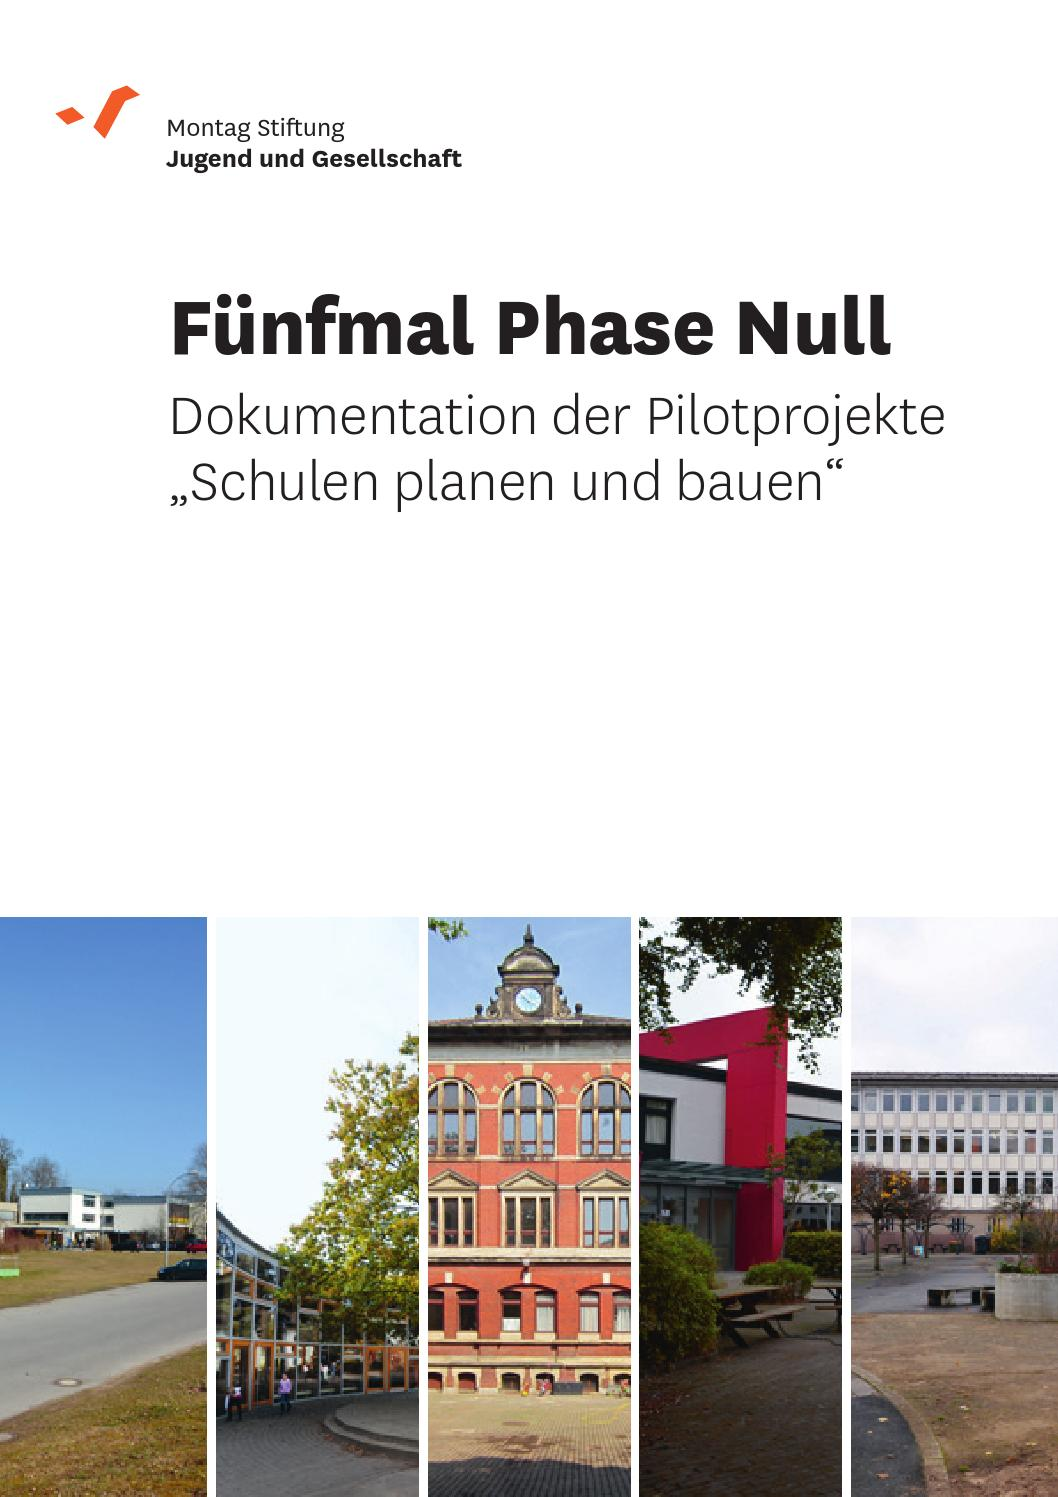 Fünfmal Phase Null by Montag Stiftungen - issuu